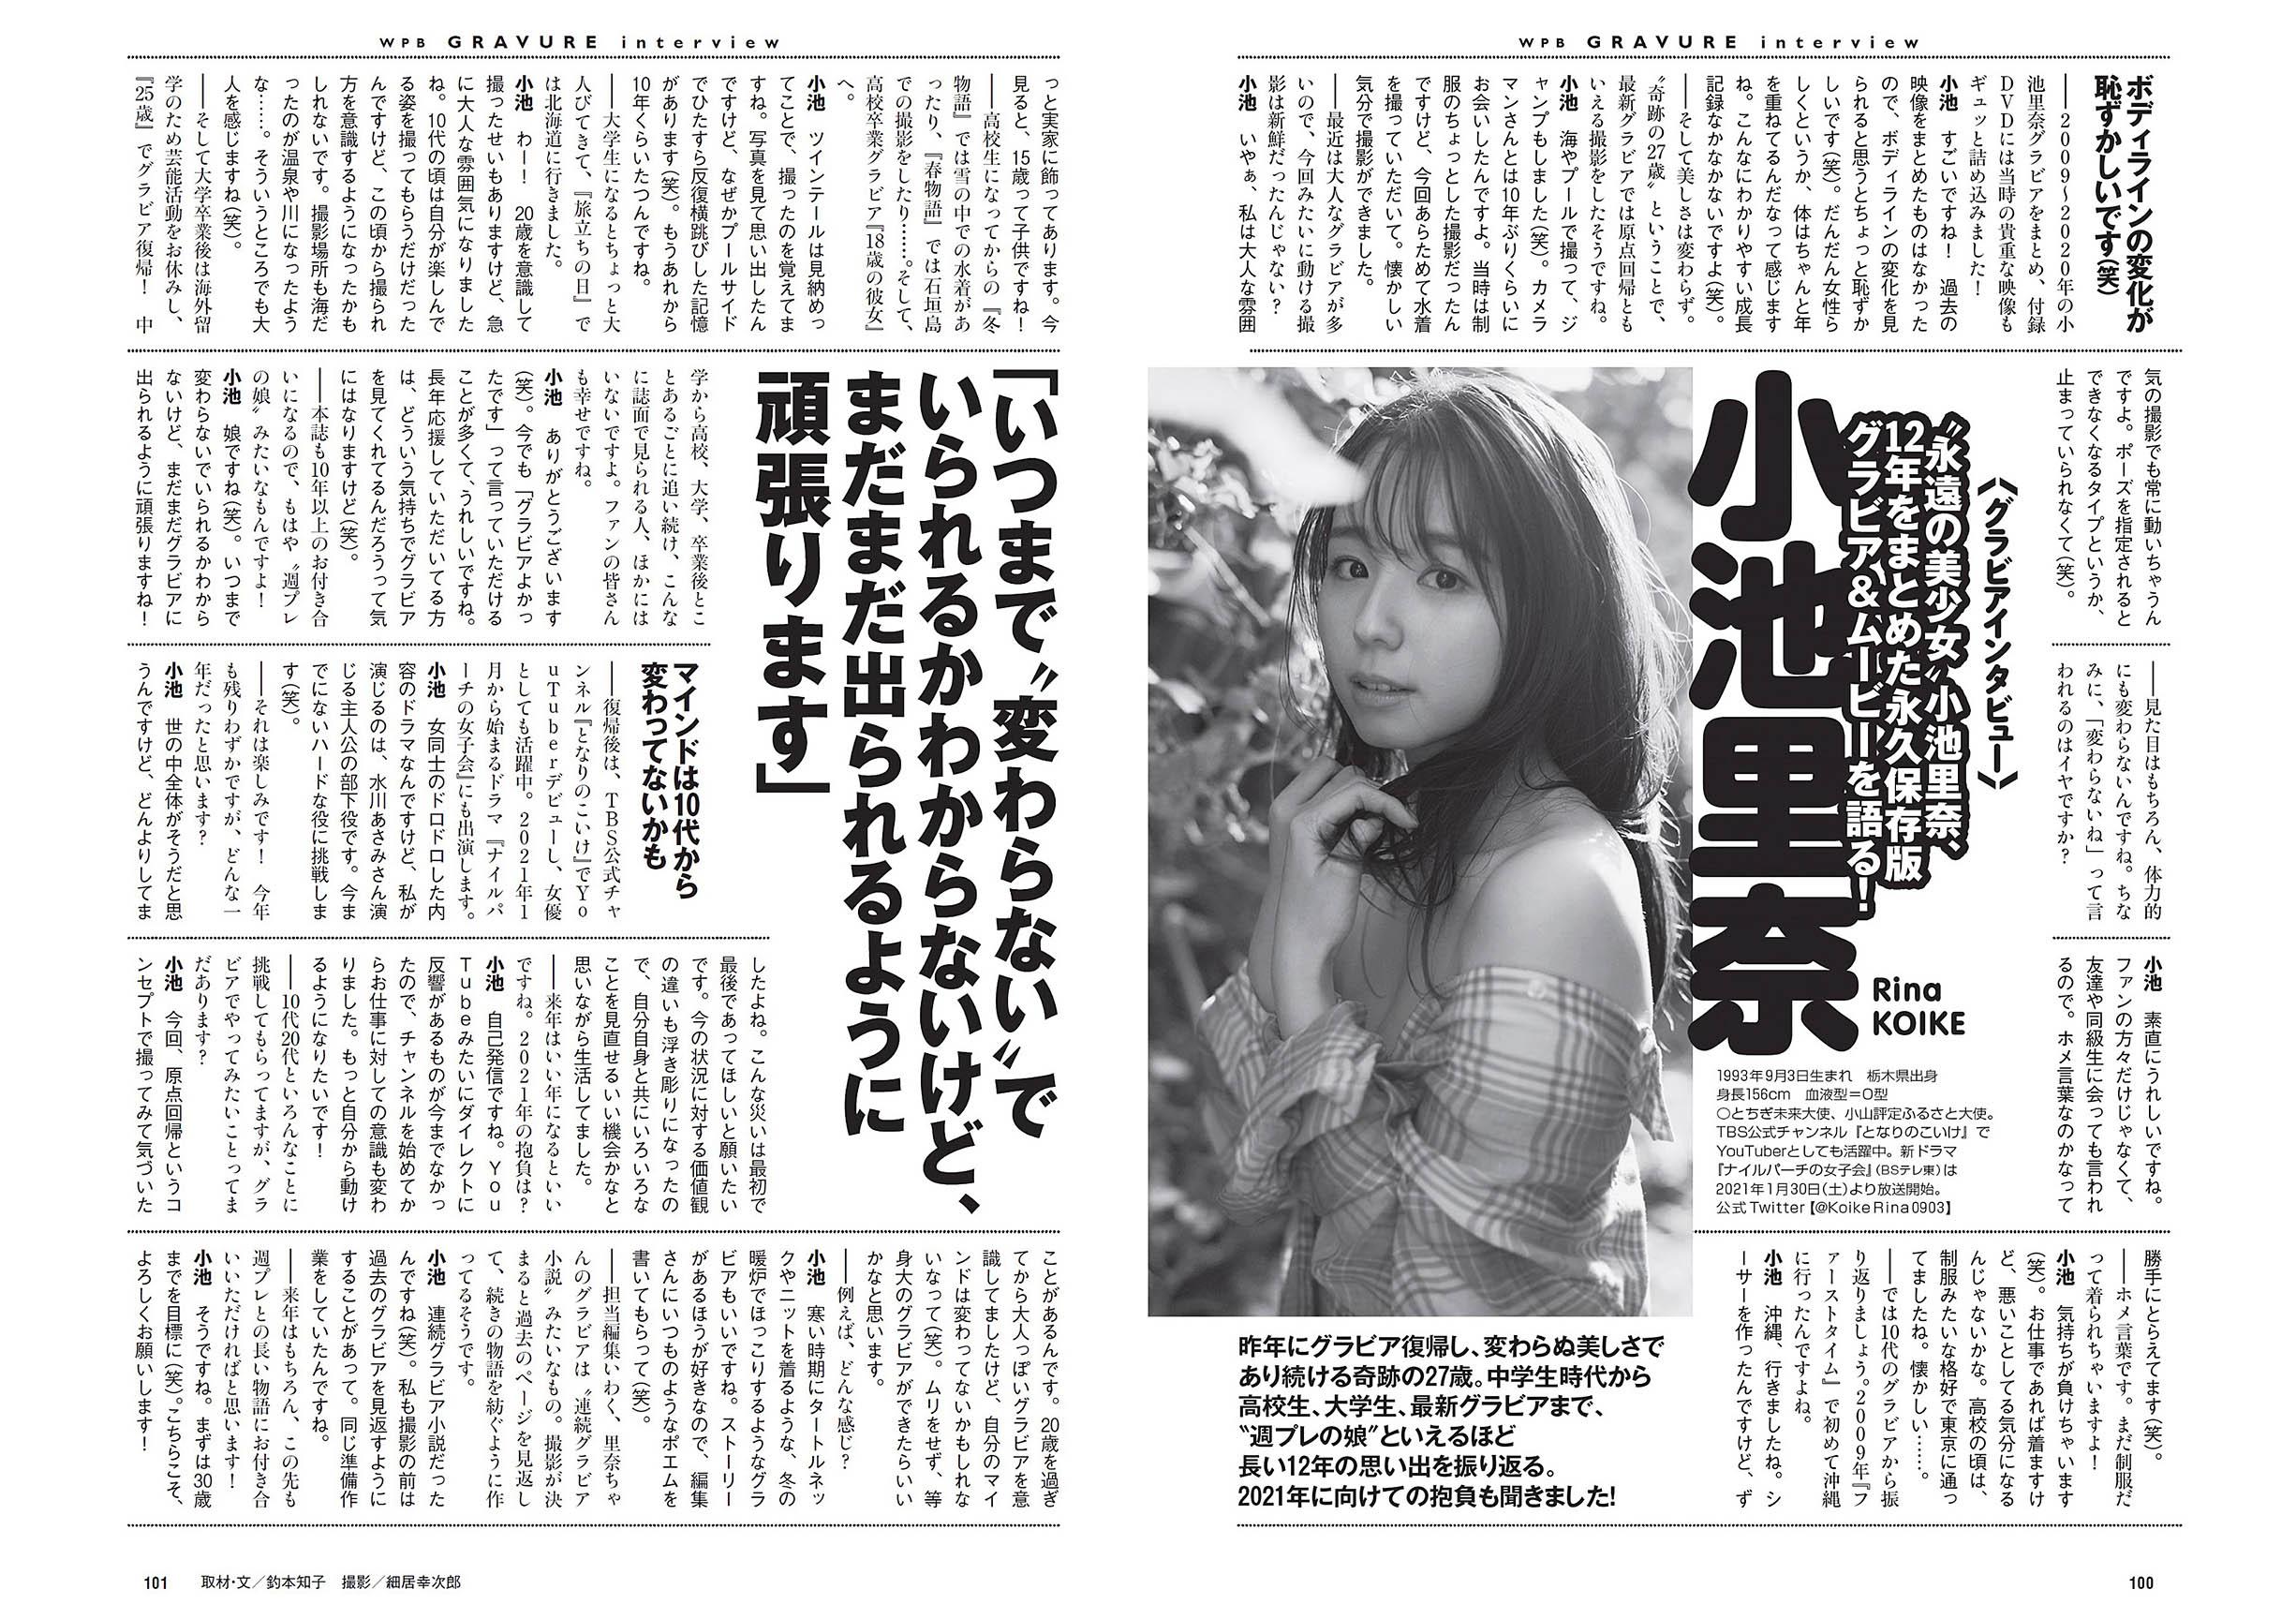 Rina Koike WPB 210111 08.jpg